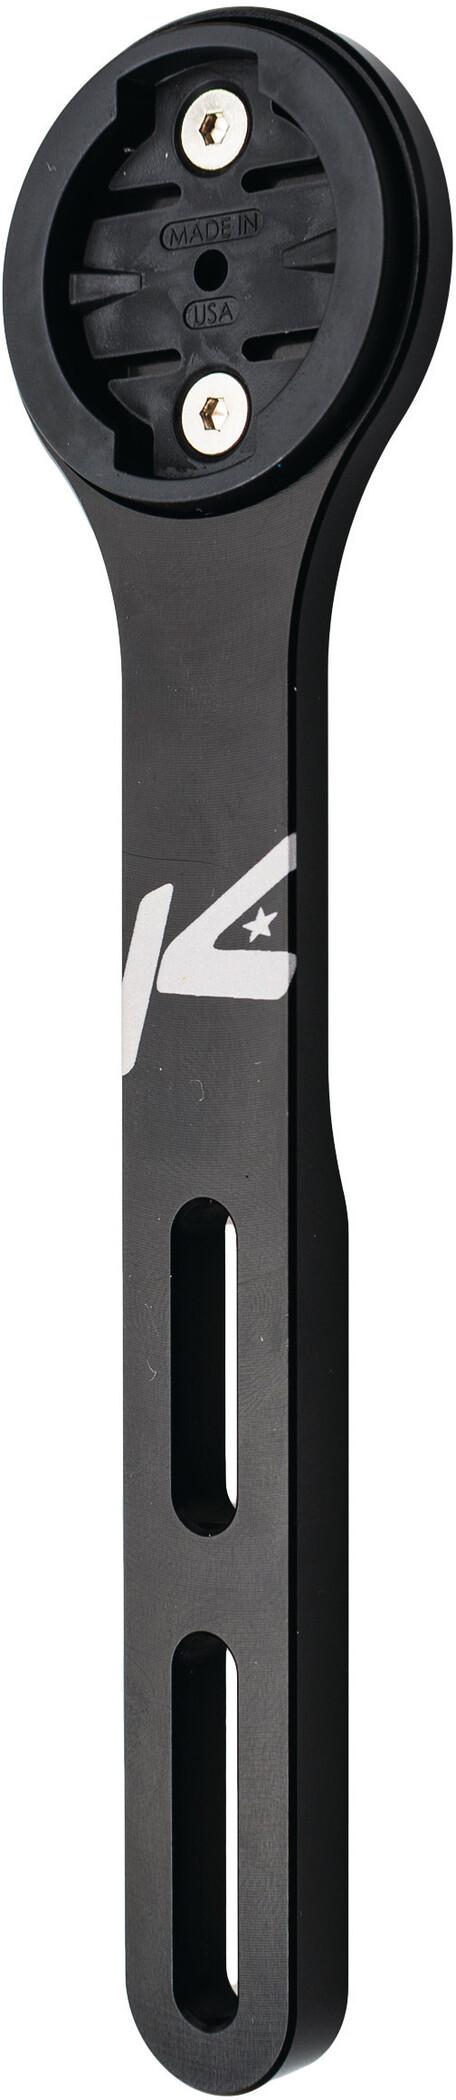 K-EDGE Garmin Splayd Race Mount Handlebar Mount, black (2019) | item_misc